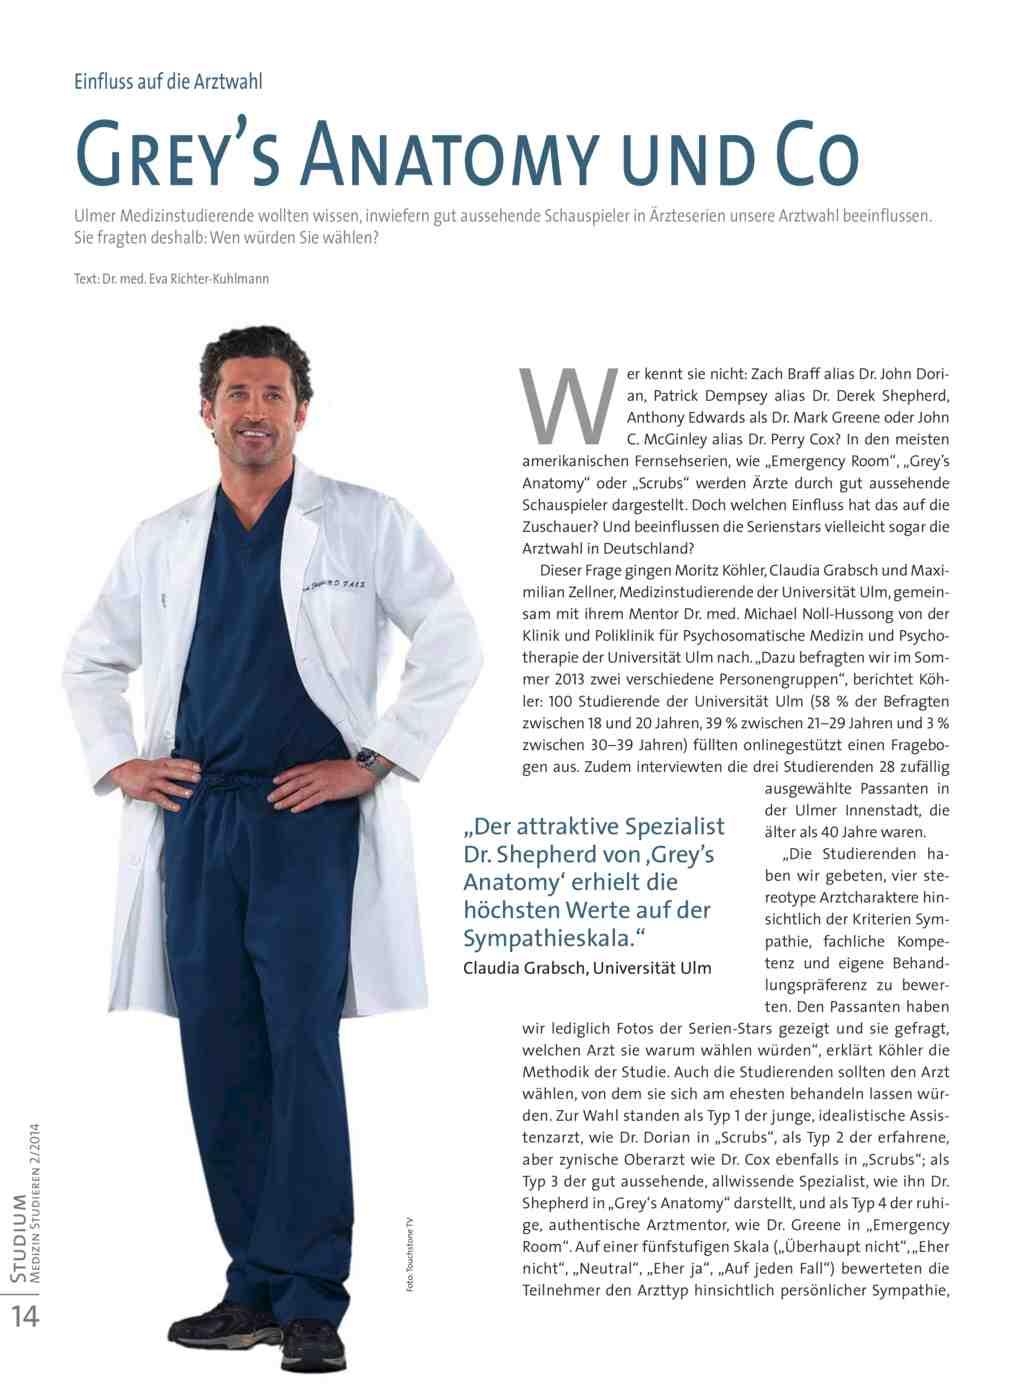 Charmant Greys Anatomy Besetzung Ideen - Anatomie Ideen - finotti.info